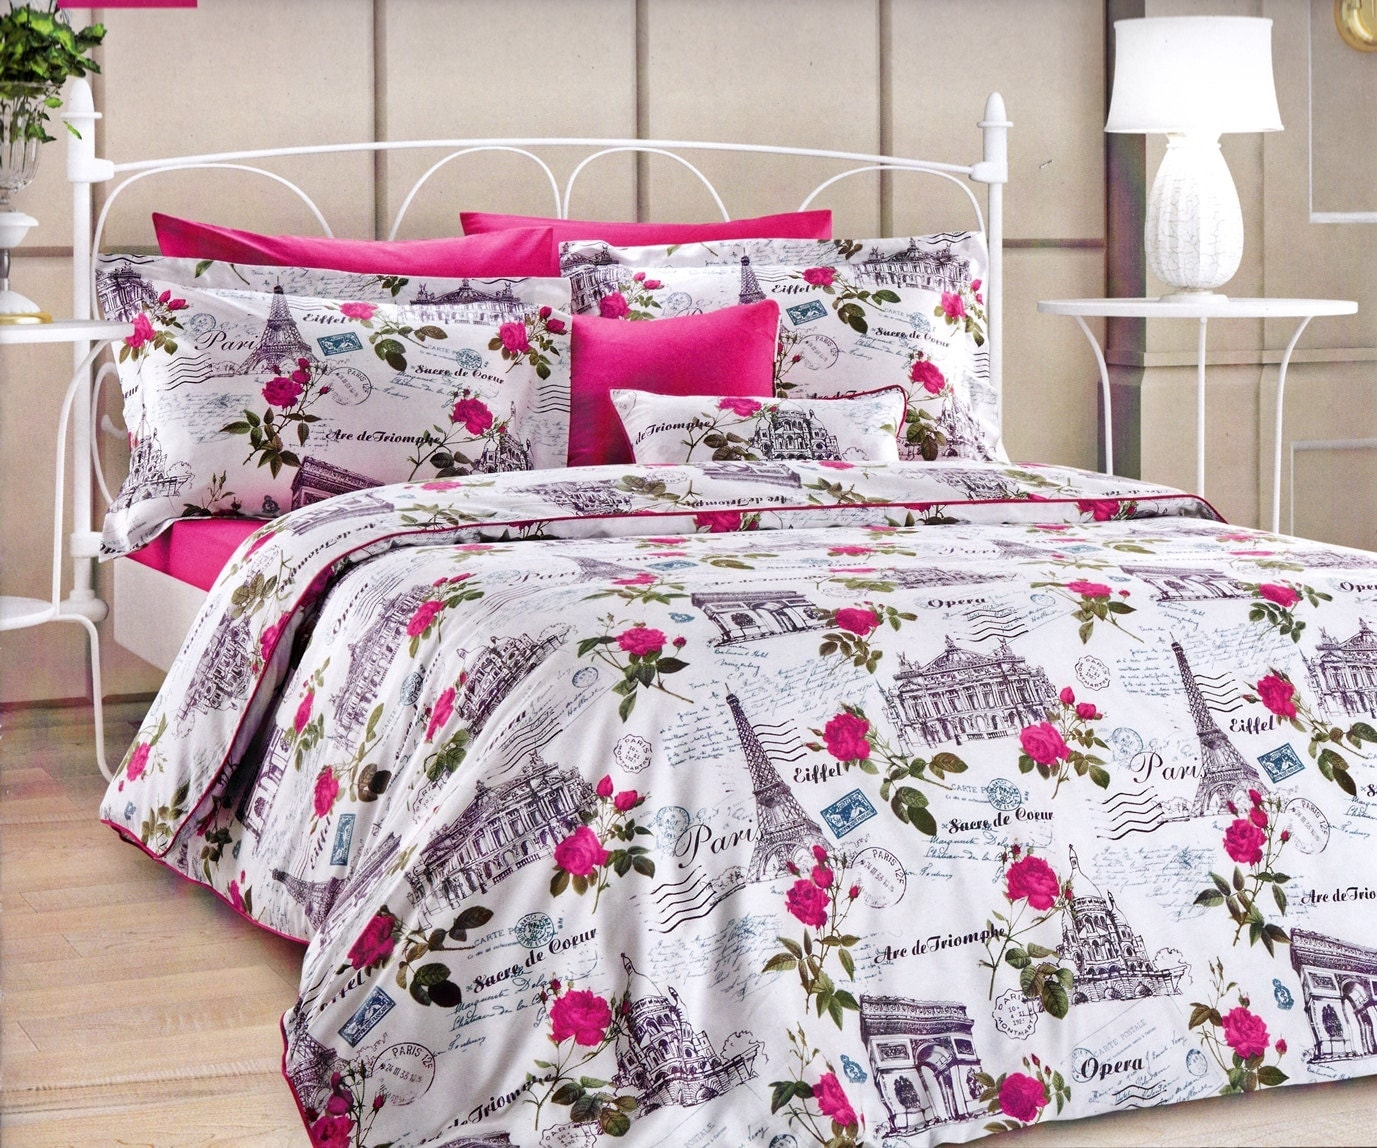 pink paris bedding set for queen or full 6 piece by myveralinen. Black Bedroom Furniture Sets. Home Design Ideas